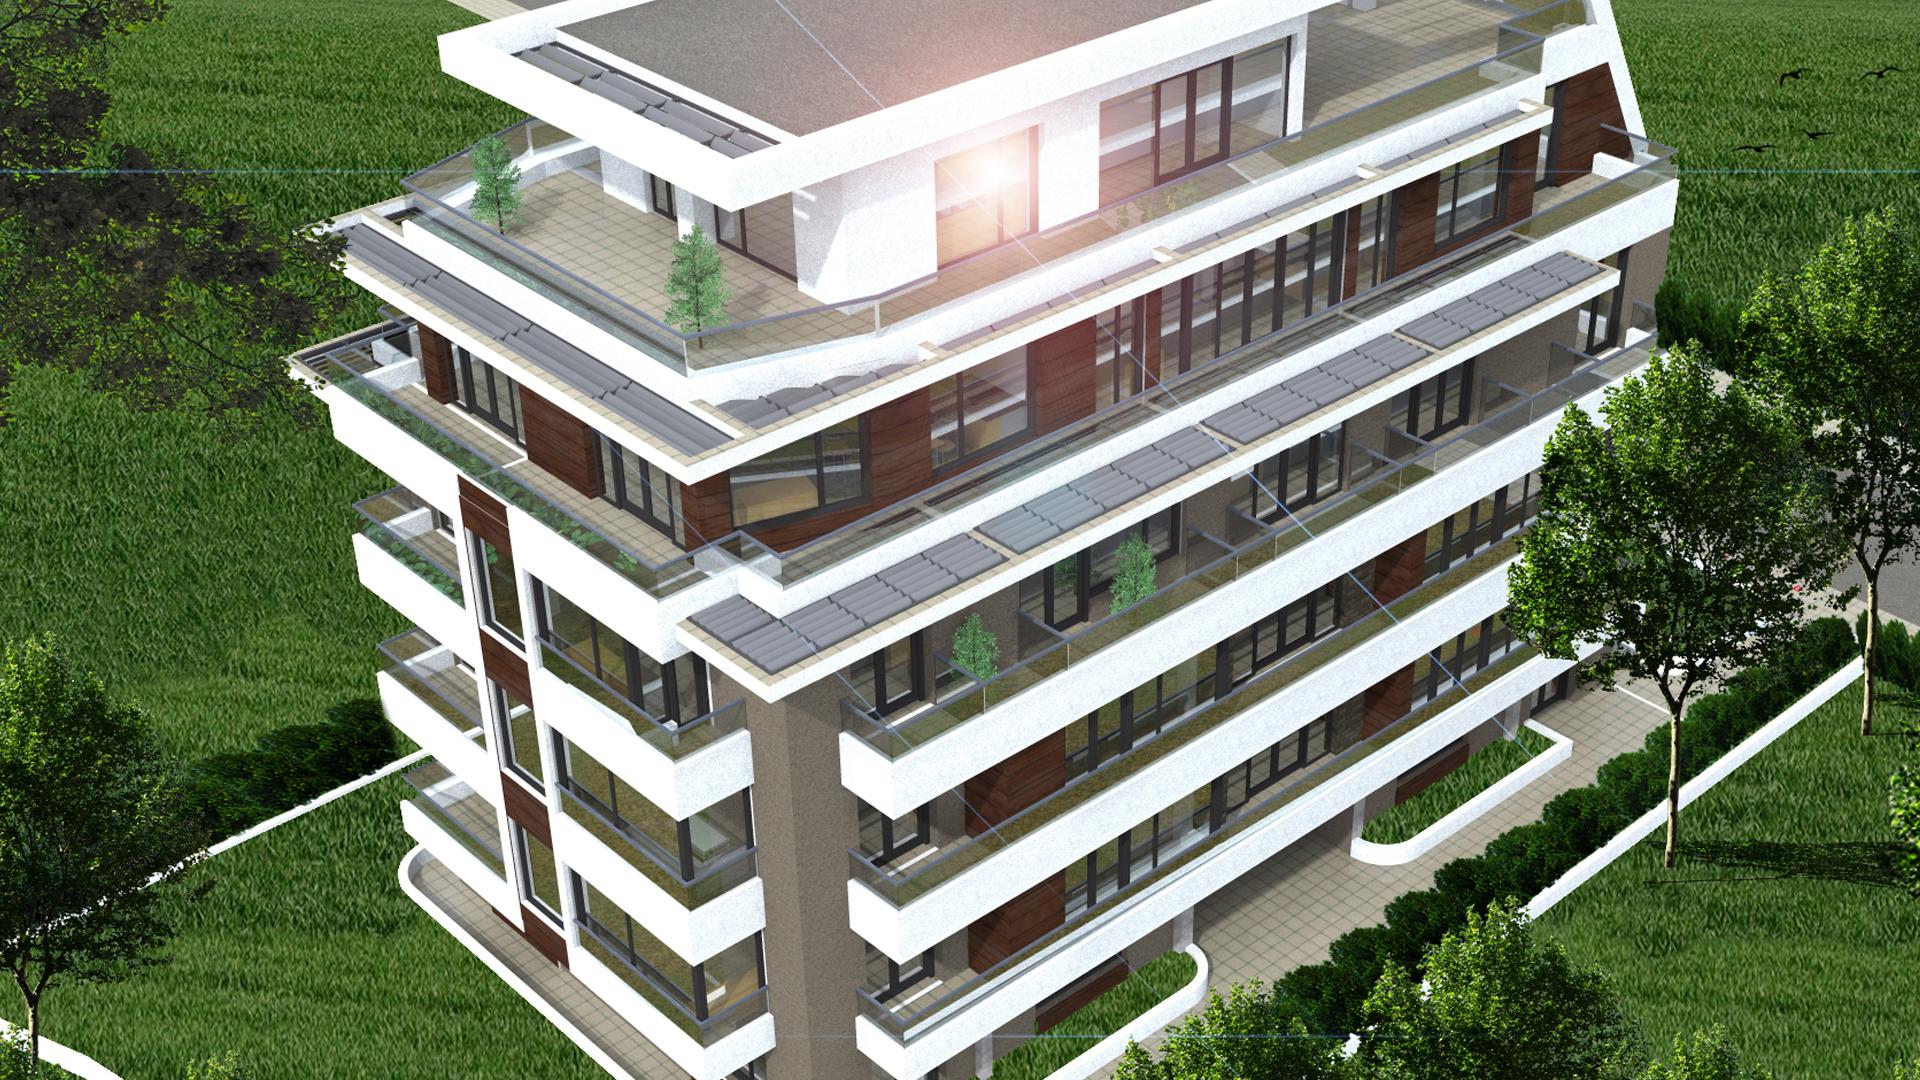 Тристаен апартамент, 121 кв. м, в новострояща се луксозна сграда, кв. Дианабад, гр. София